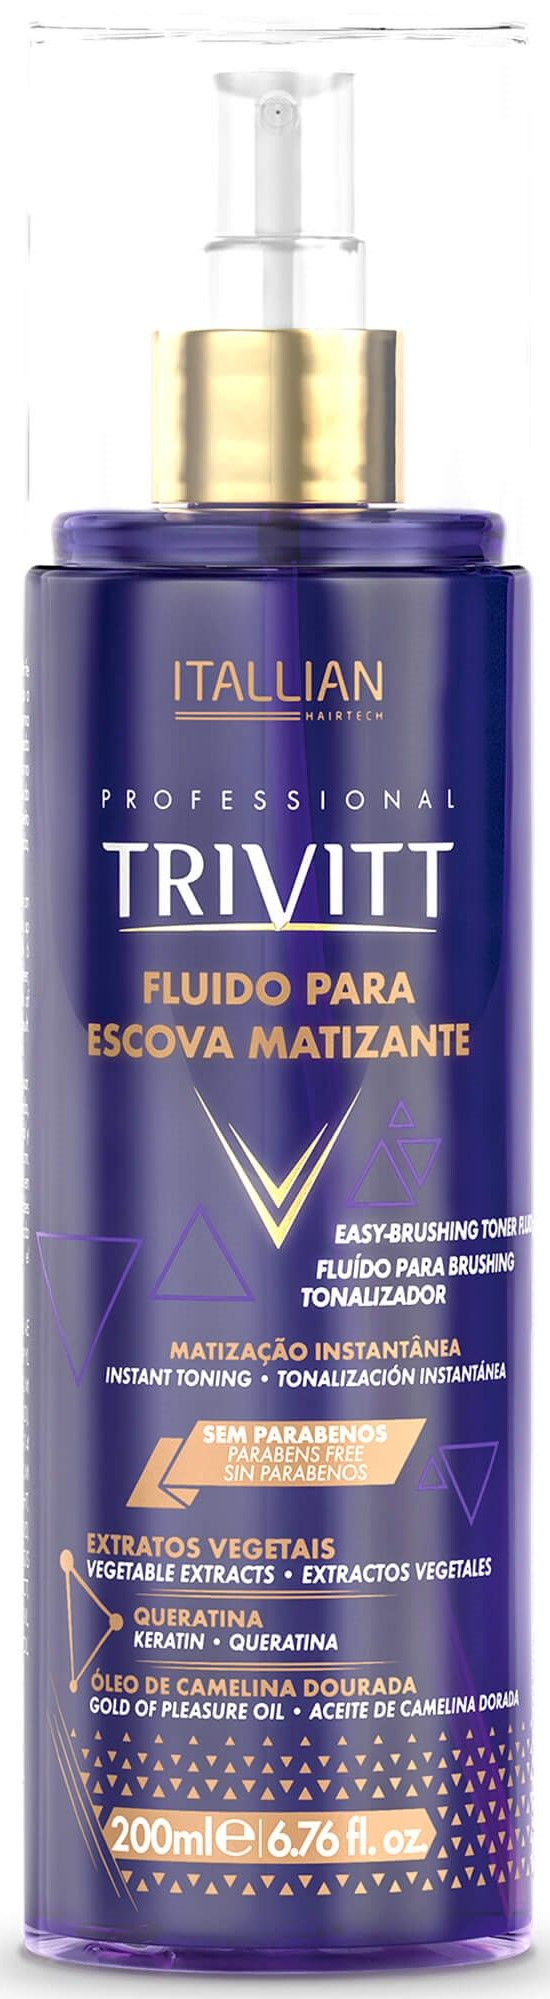 Fluido Para Escova Itallian Trivitt Matizante - 200ml